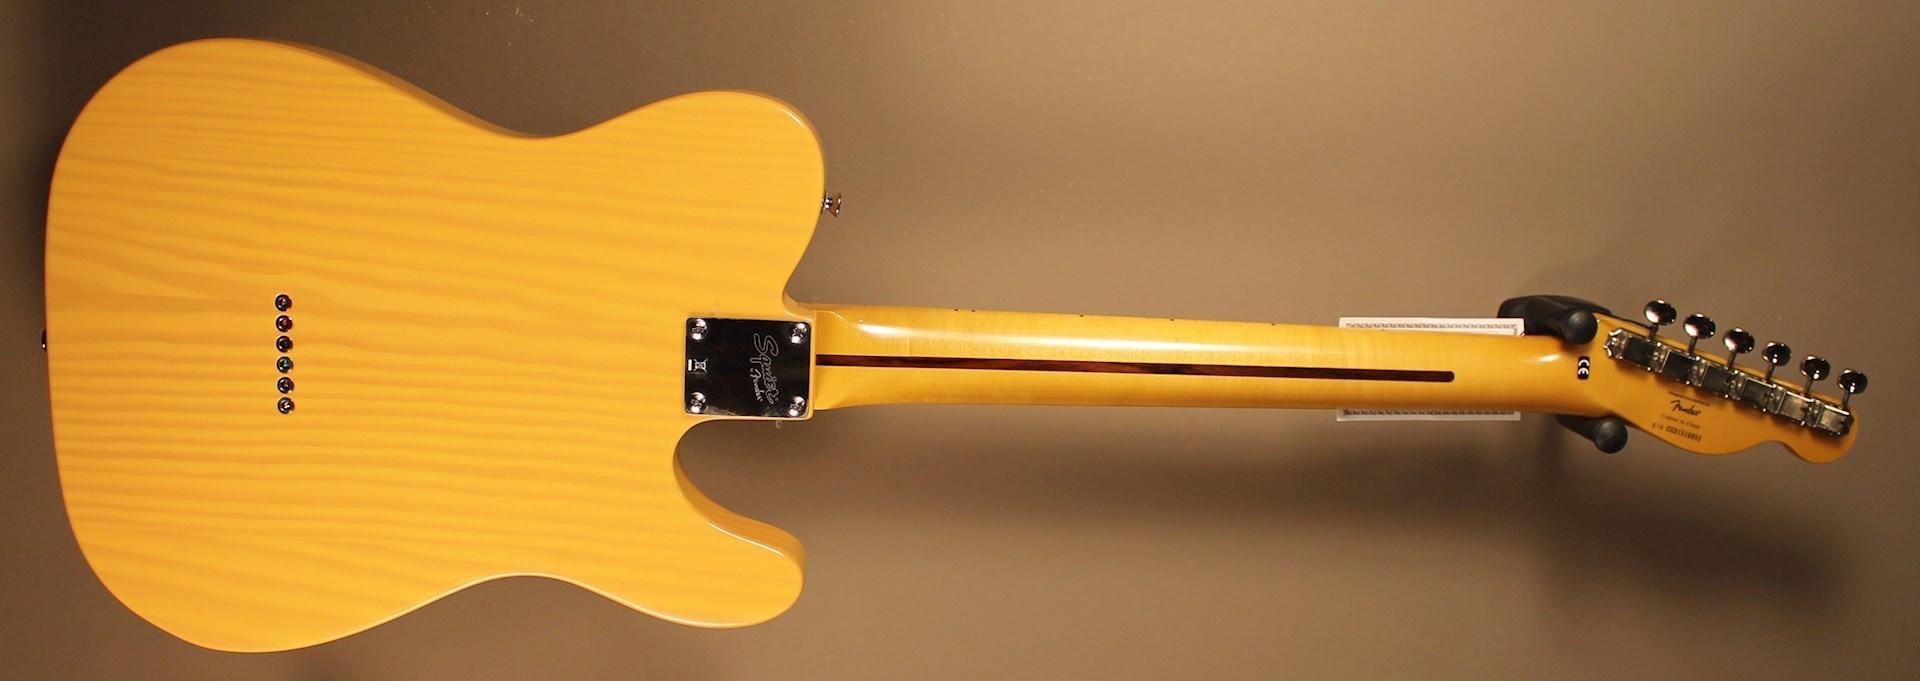 Squier Classic Vibe 50s Telecaster Lh Butterscotch Blonde